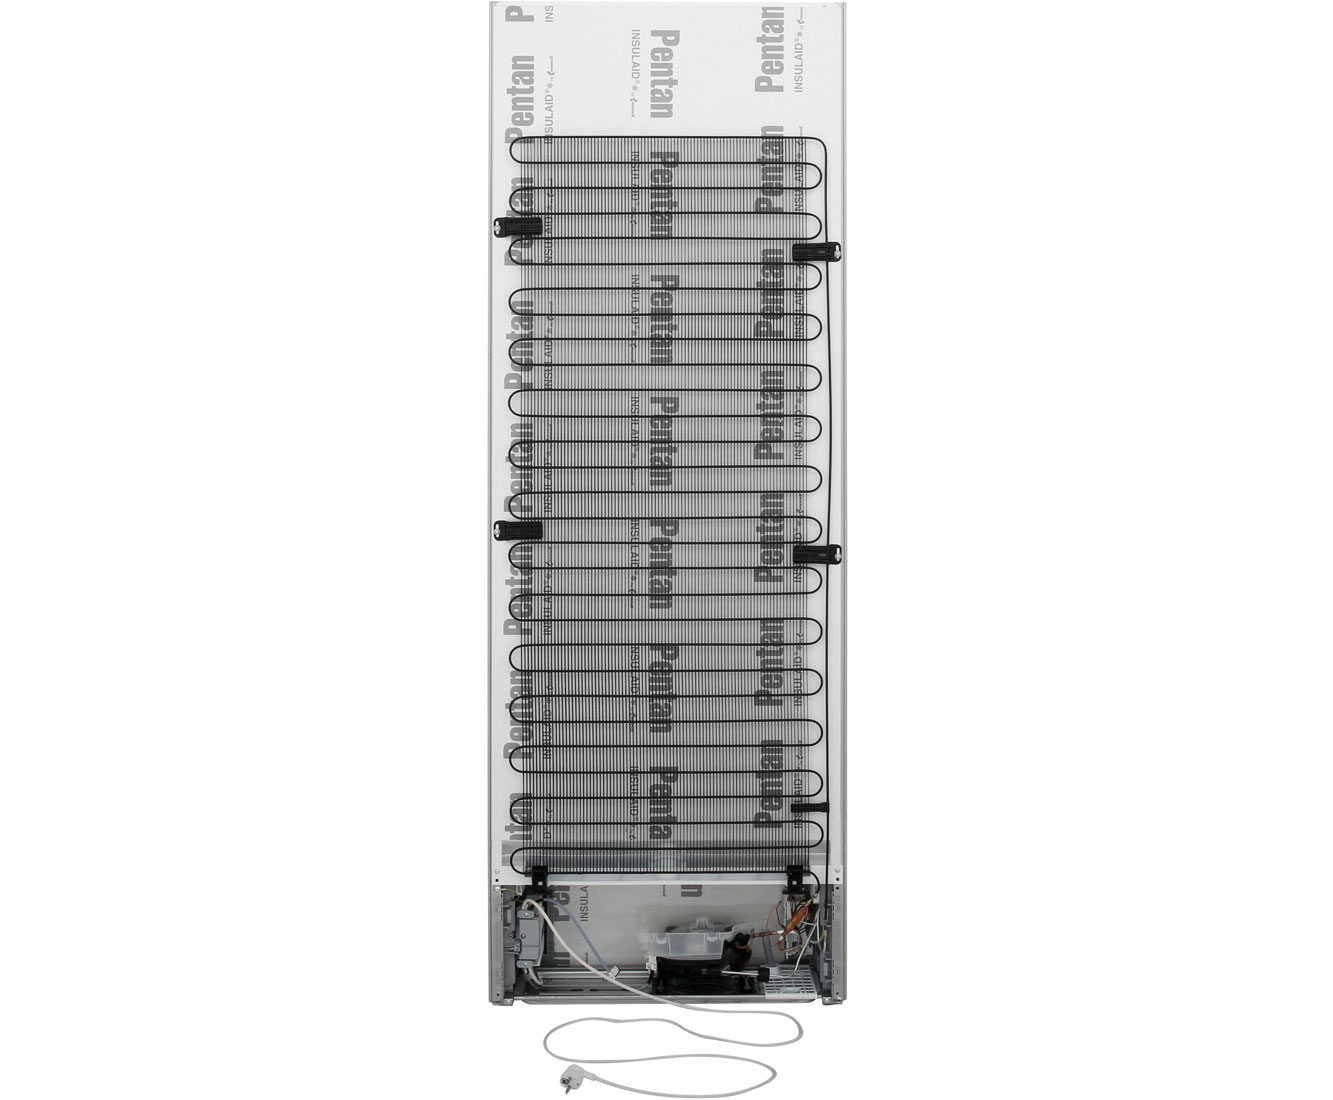 Siemens Kühlschrank Quietscht : Kühlschrank scharniere quietschen türscharniere schmieren u